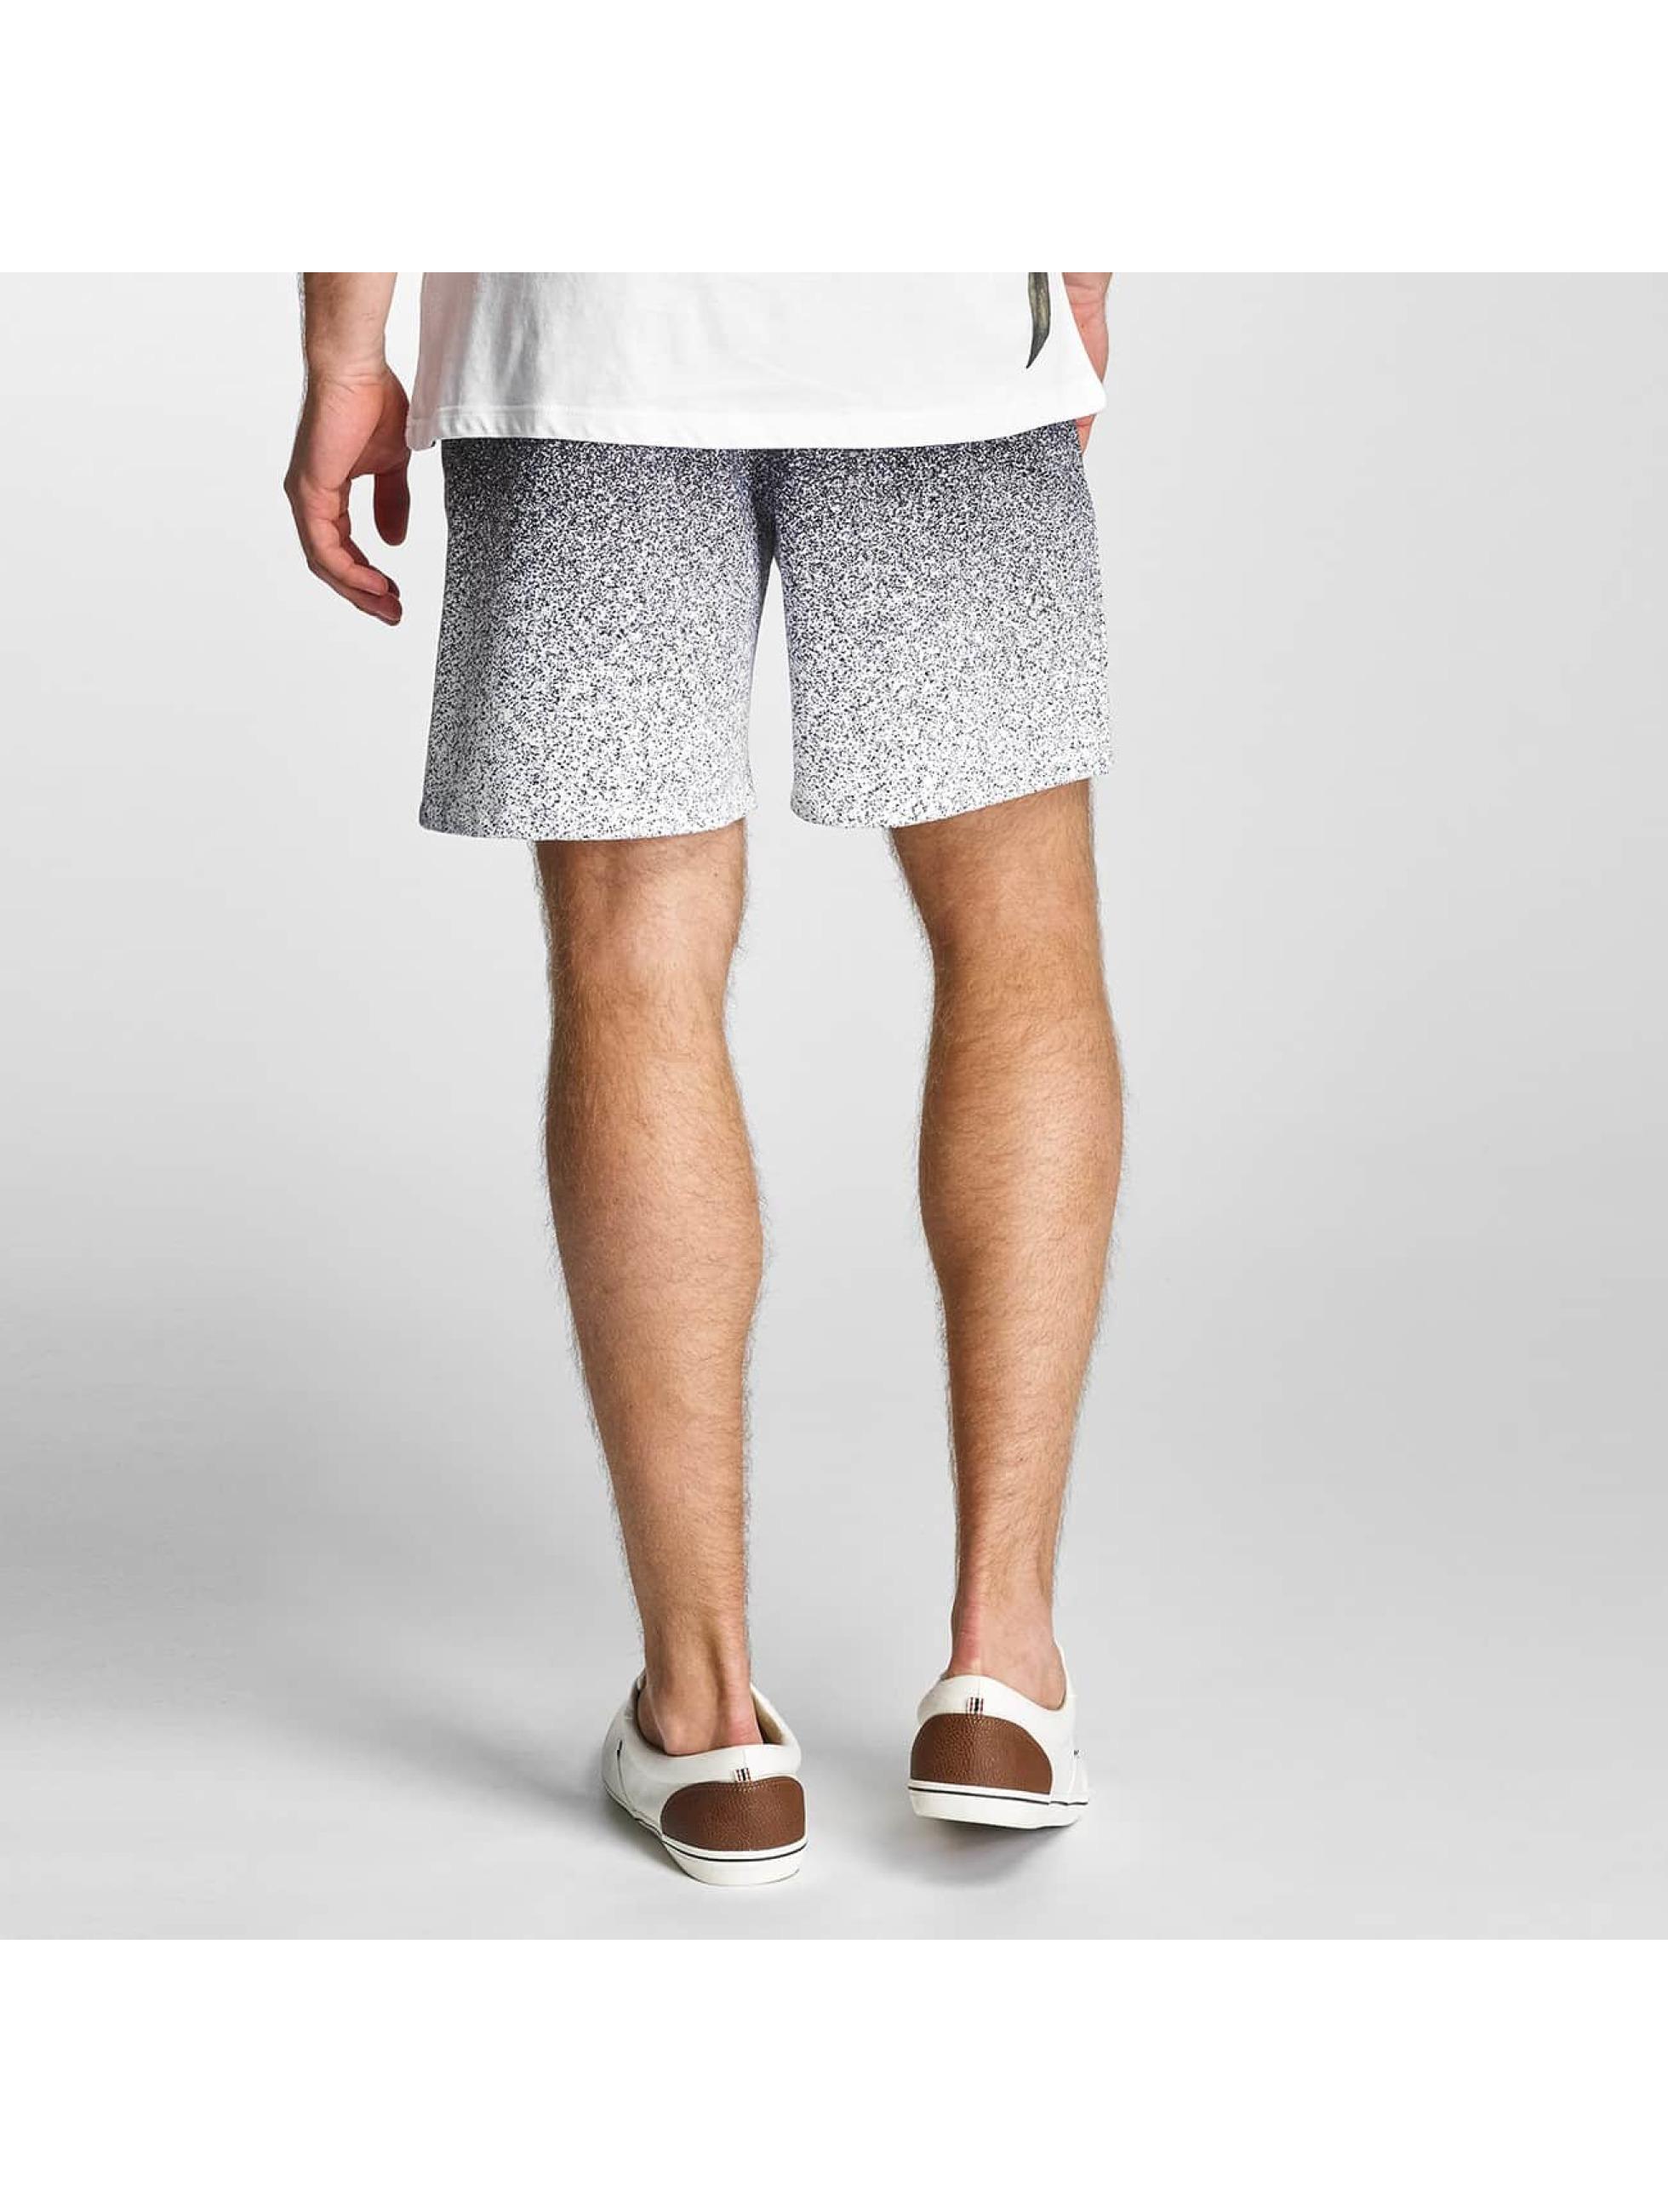 HYPE Shorts Speckle Gradient sort